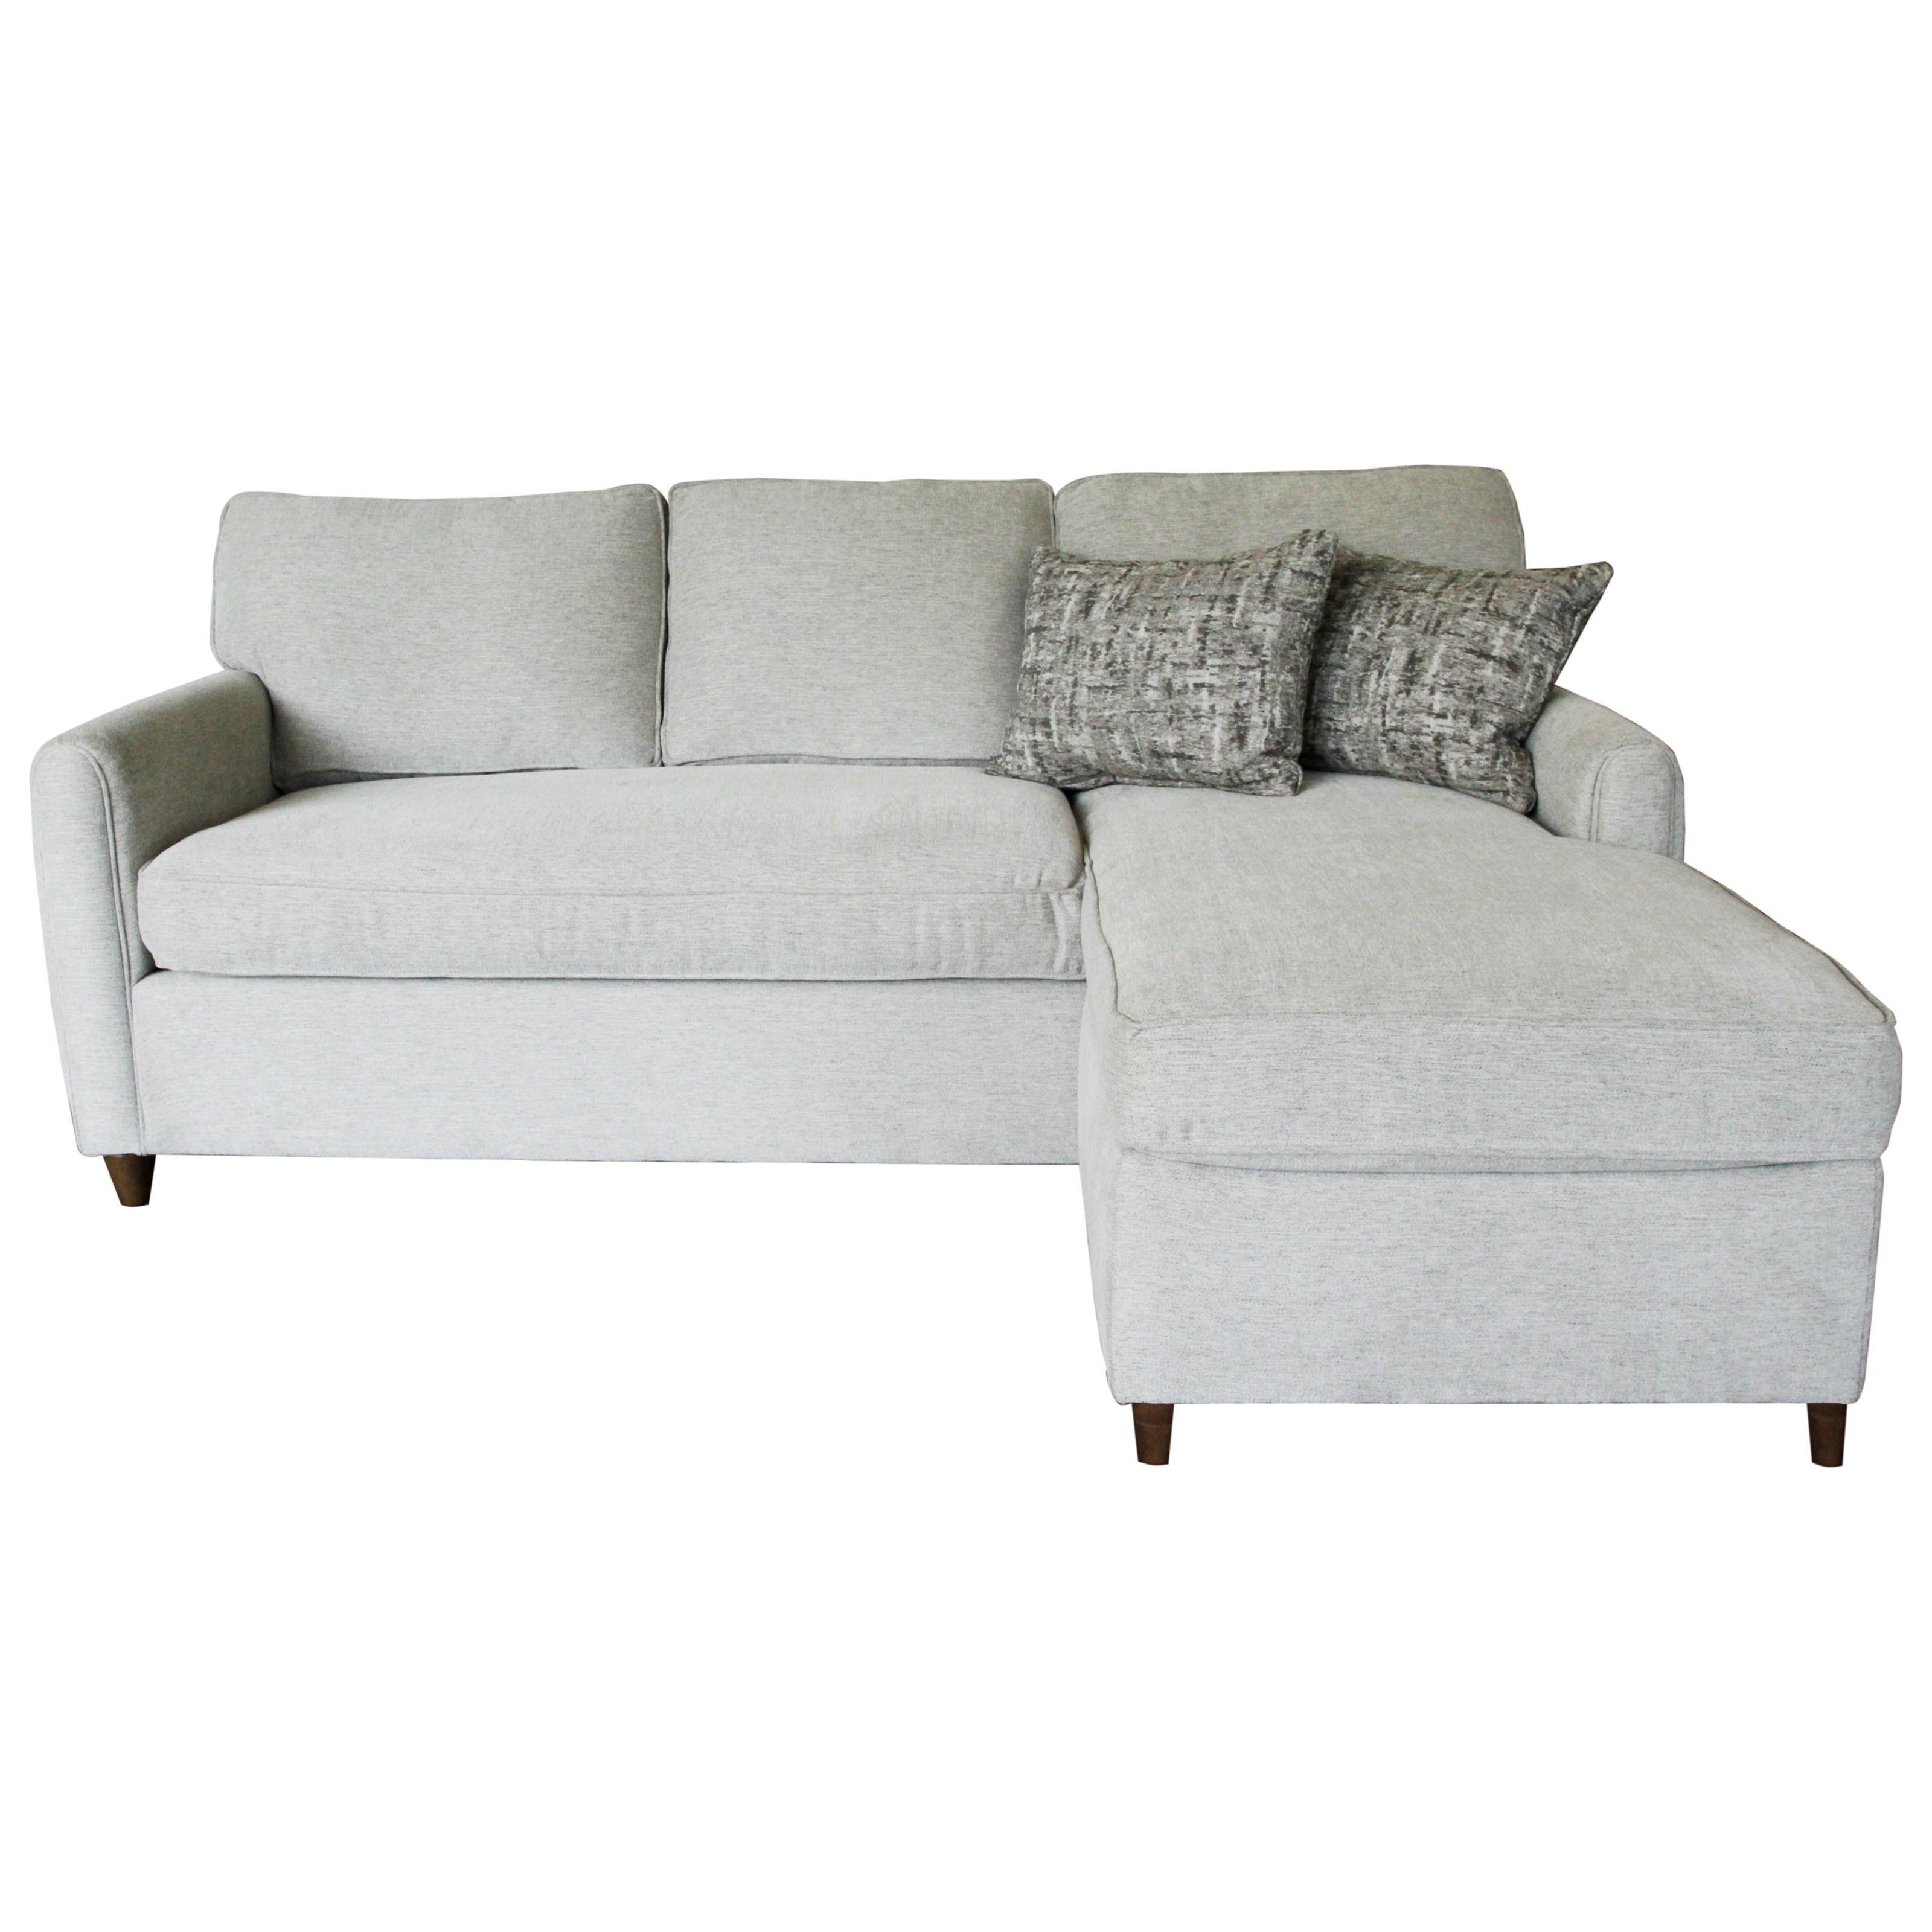 jonathan louis emory casual sofa with